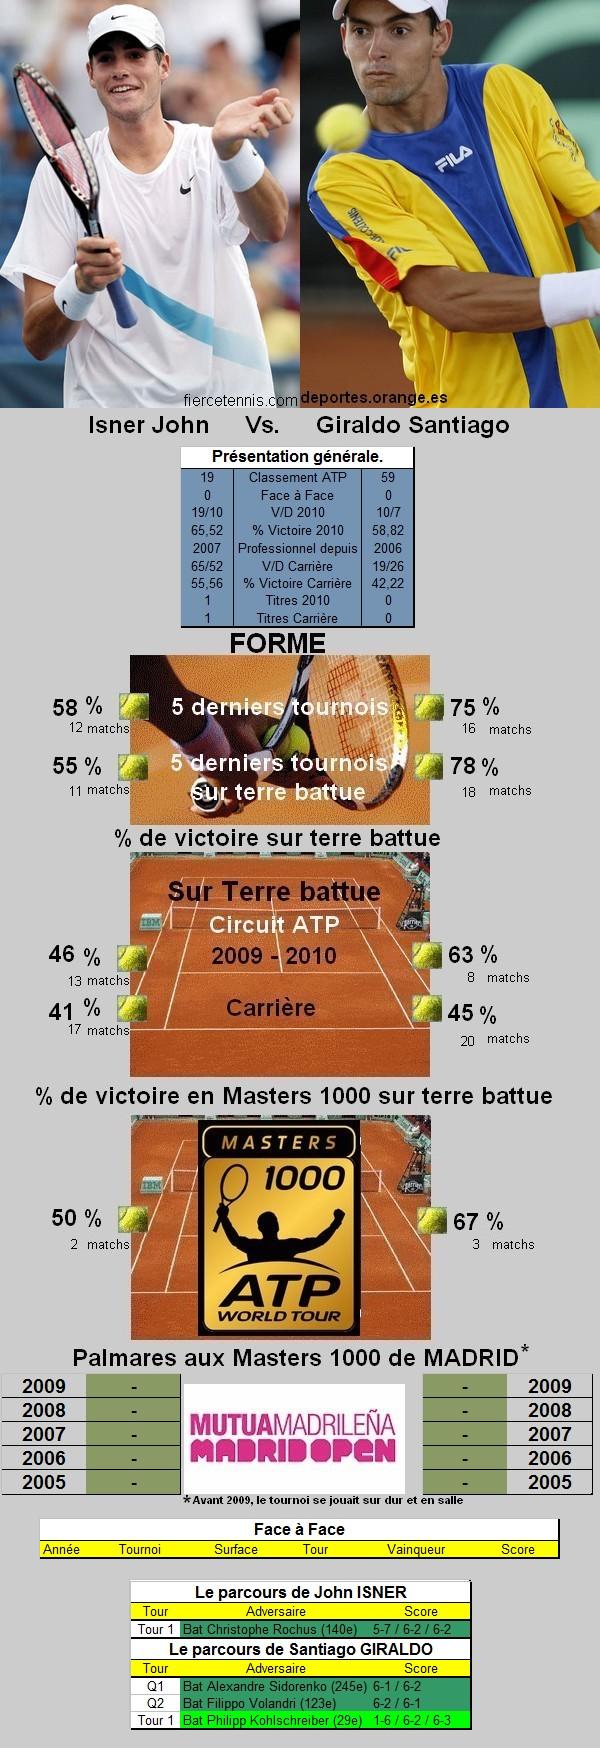 Statistiques tennis de Isner contre Giraldo à Madrid